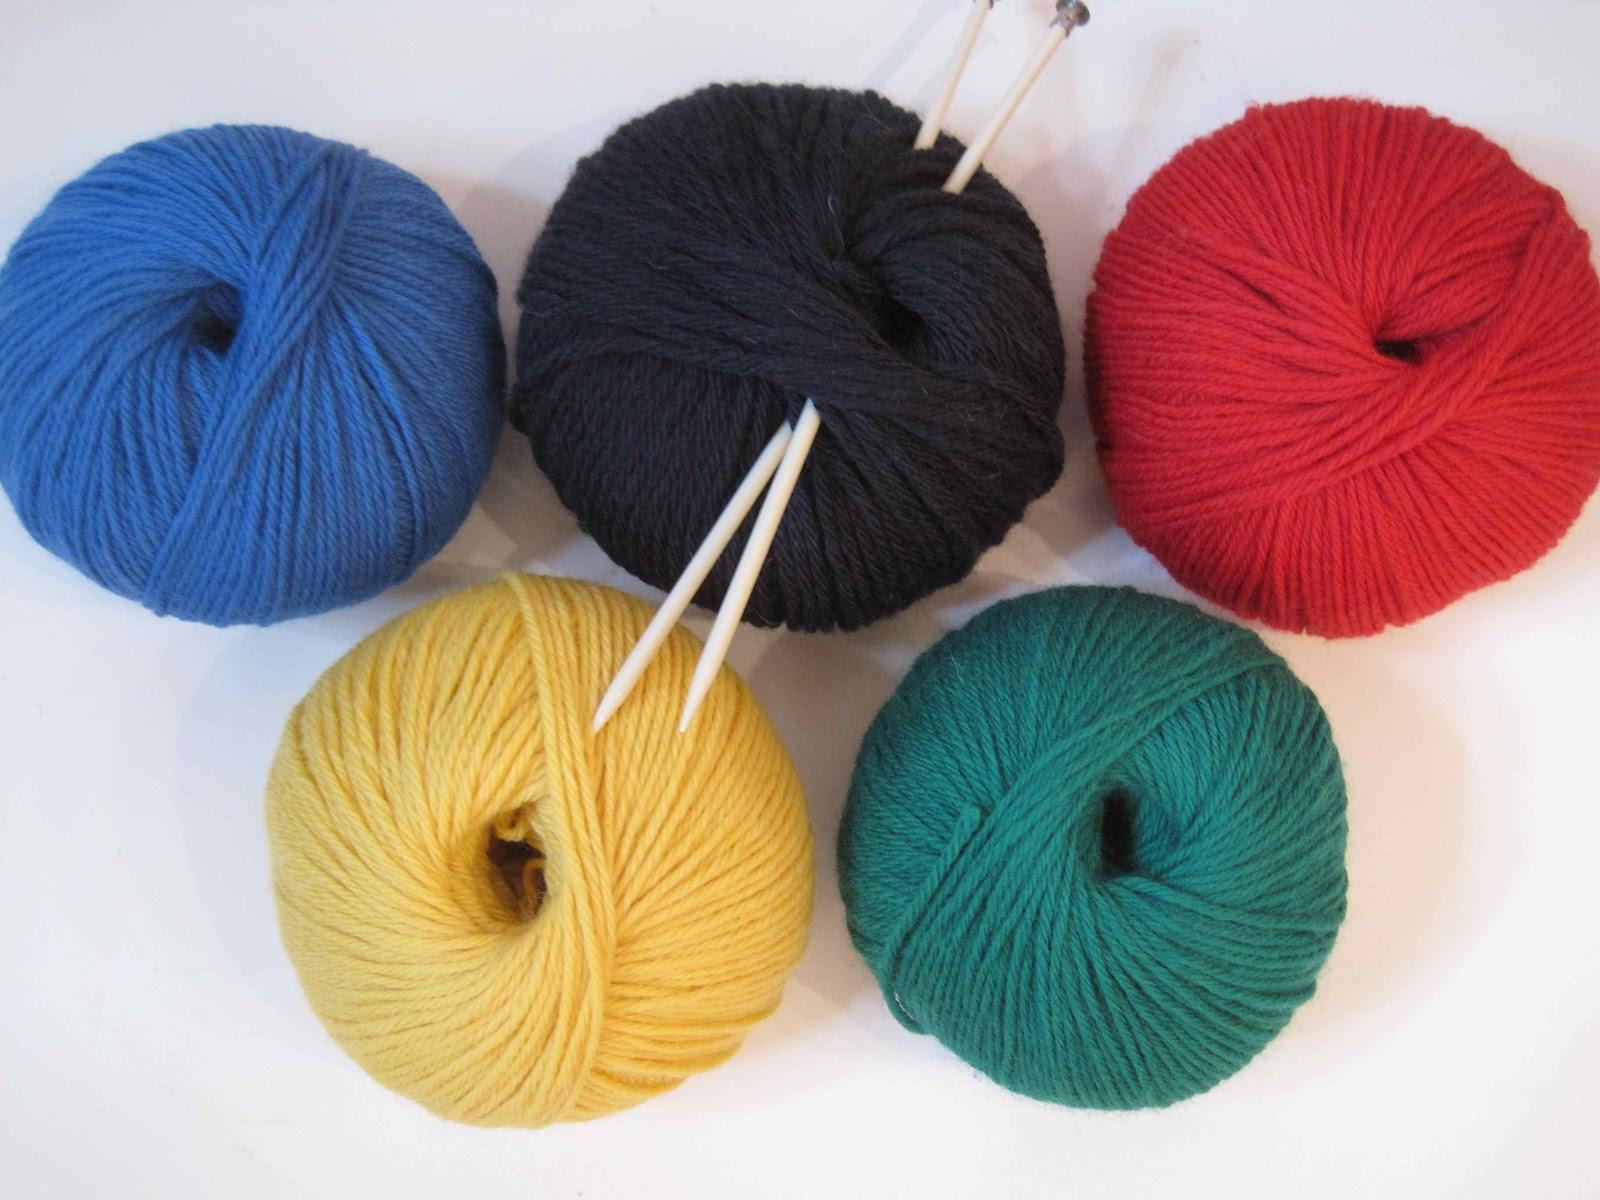 Knitting Olympics Ravelry : The drunken yarn